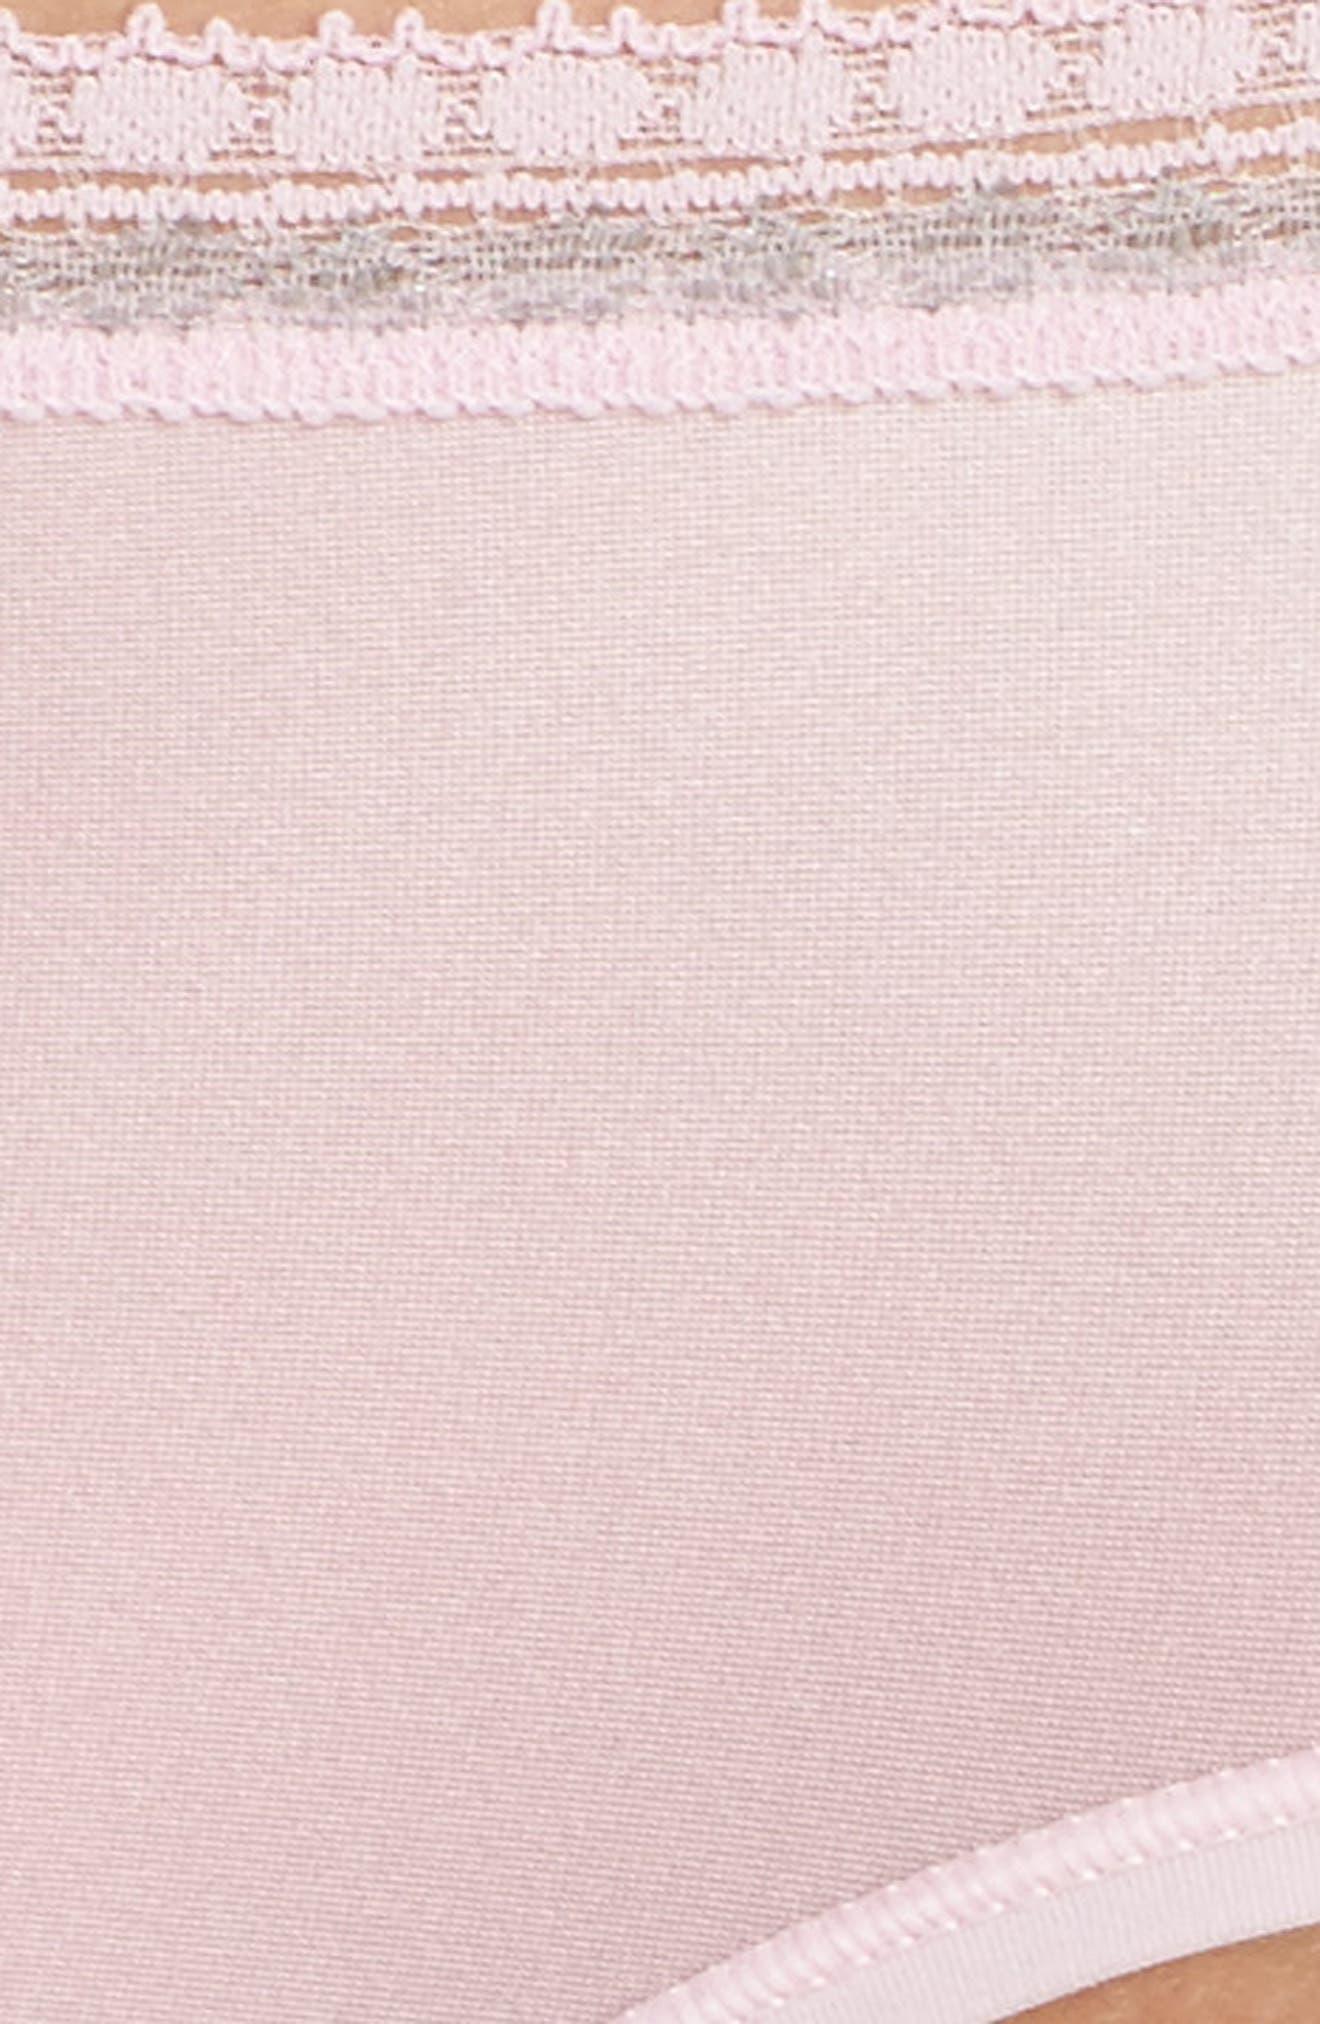 High Cut Briefs,                             Alternate thumbnail 9, color,                             Pink Lady